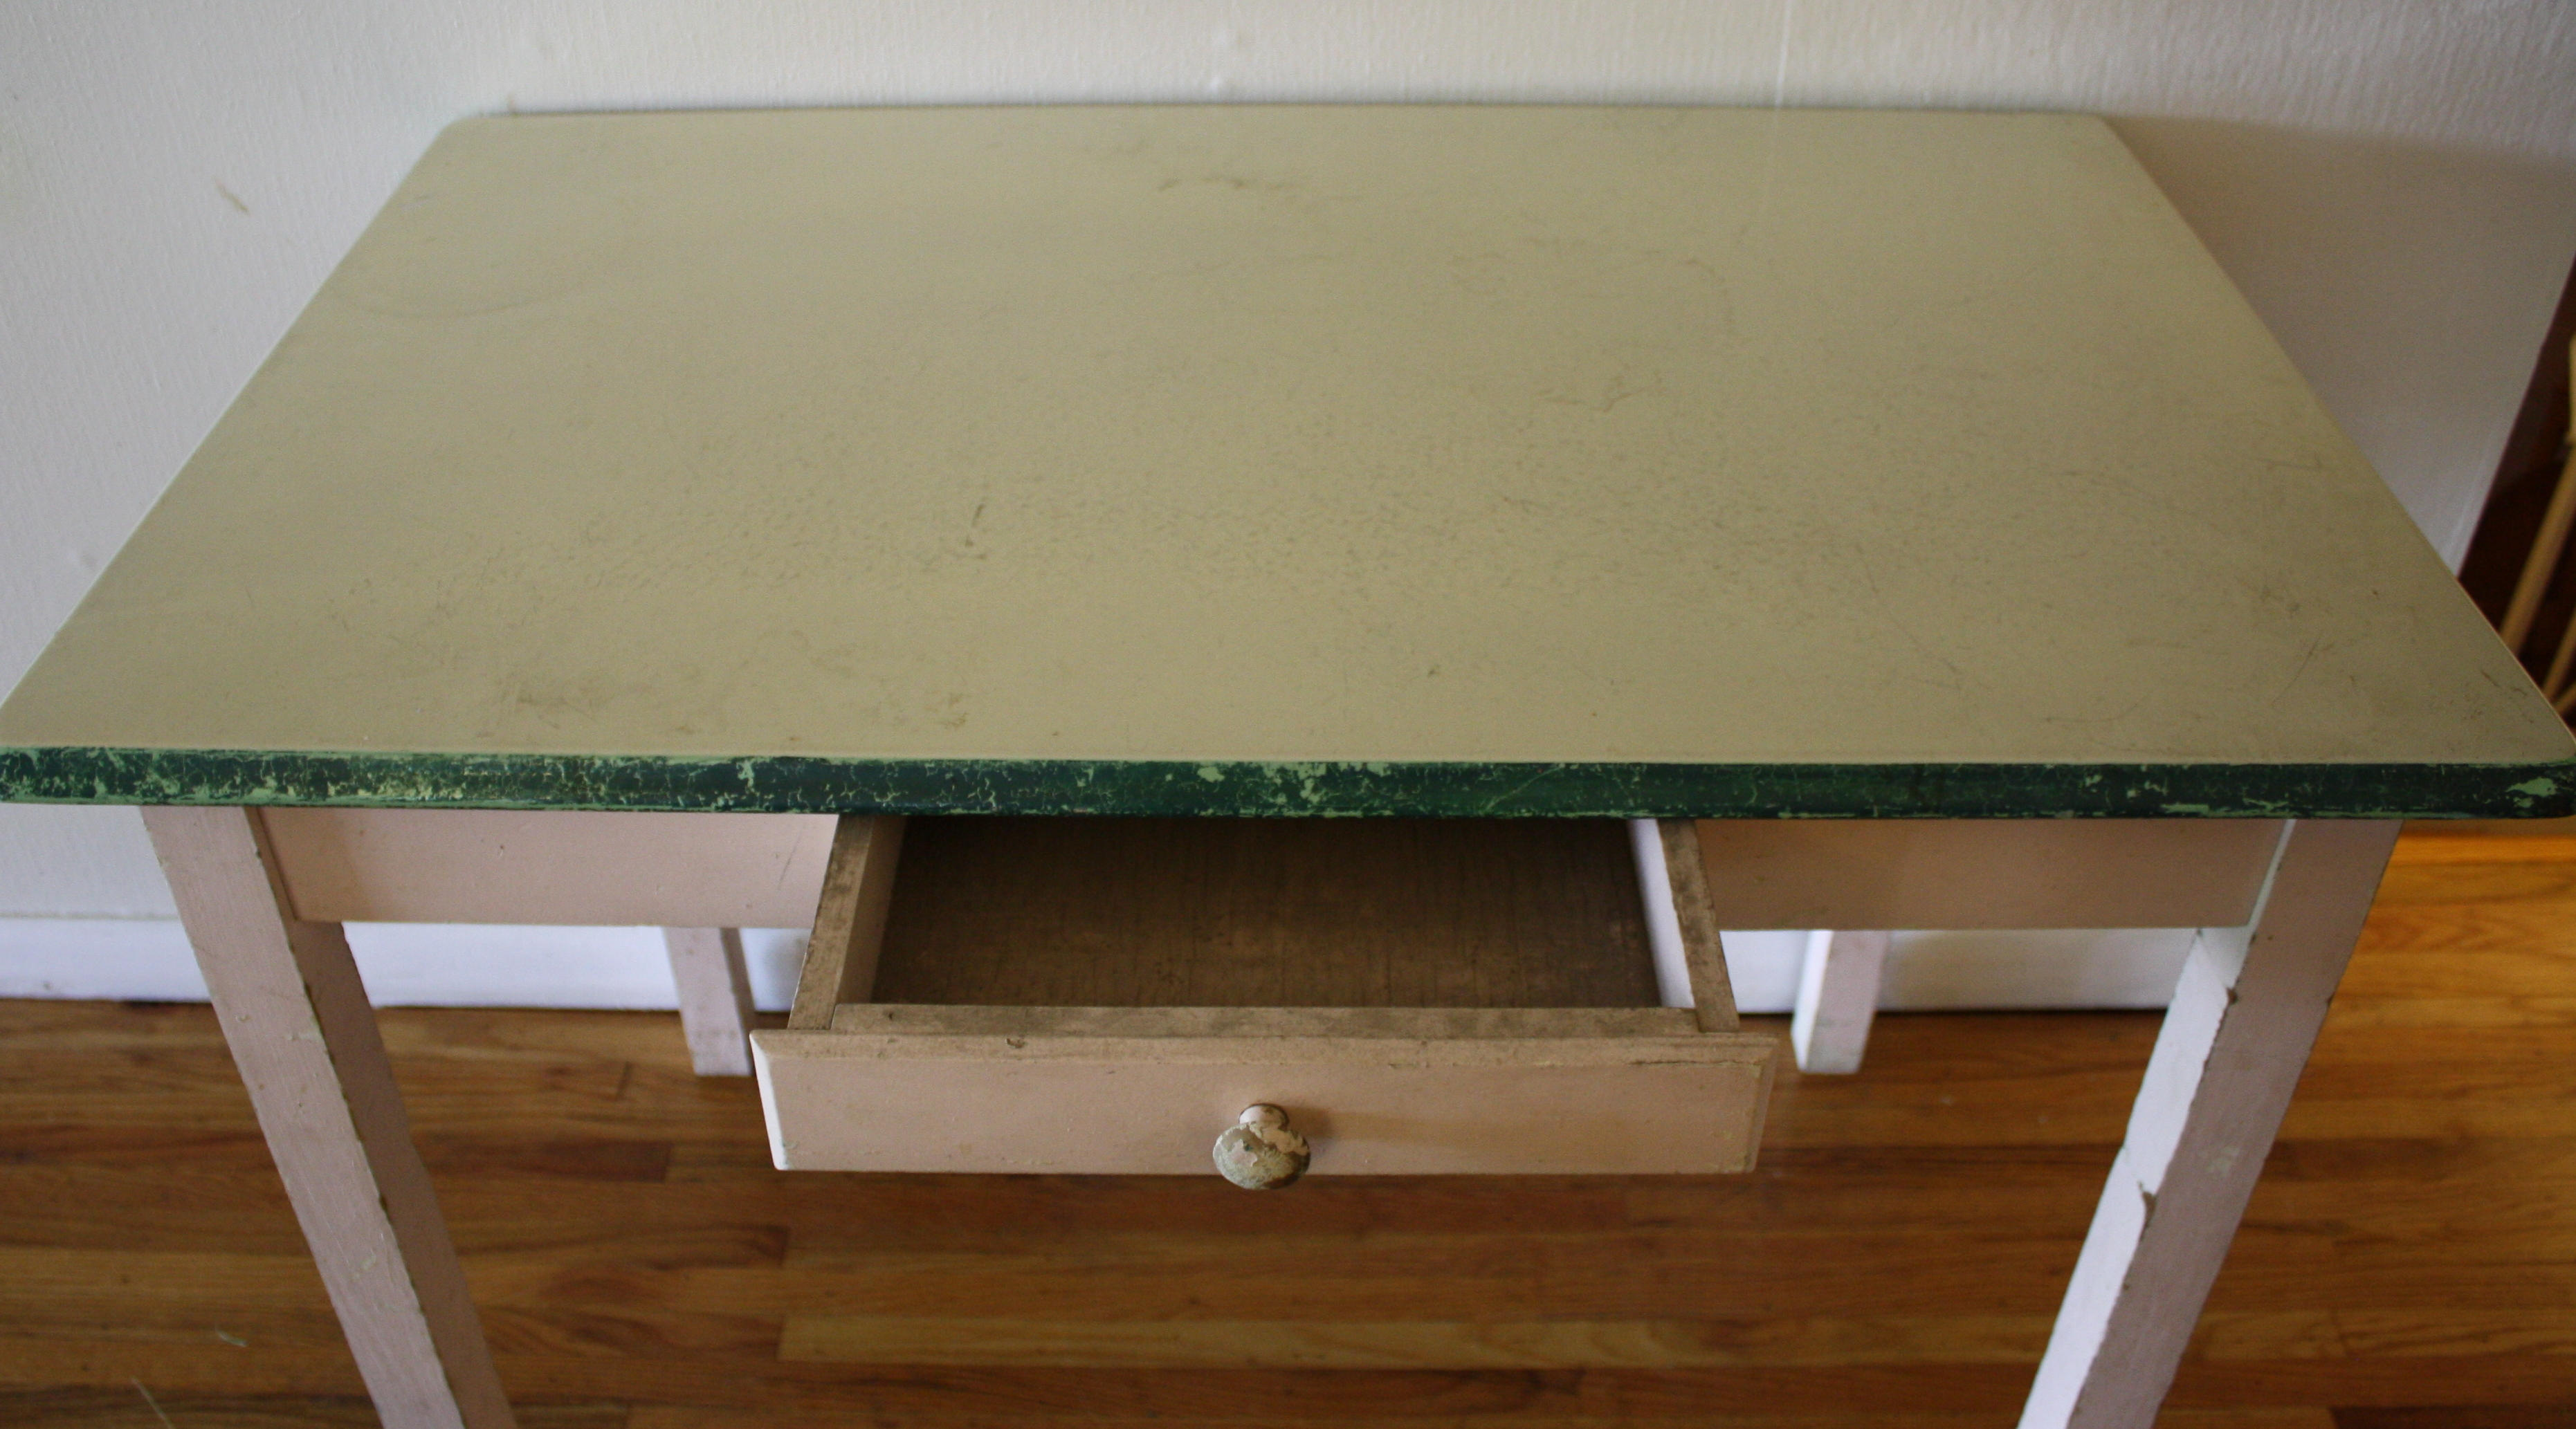 Antique Enamel Top Farmhouse Table Picked Vintage